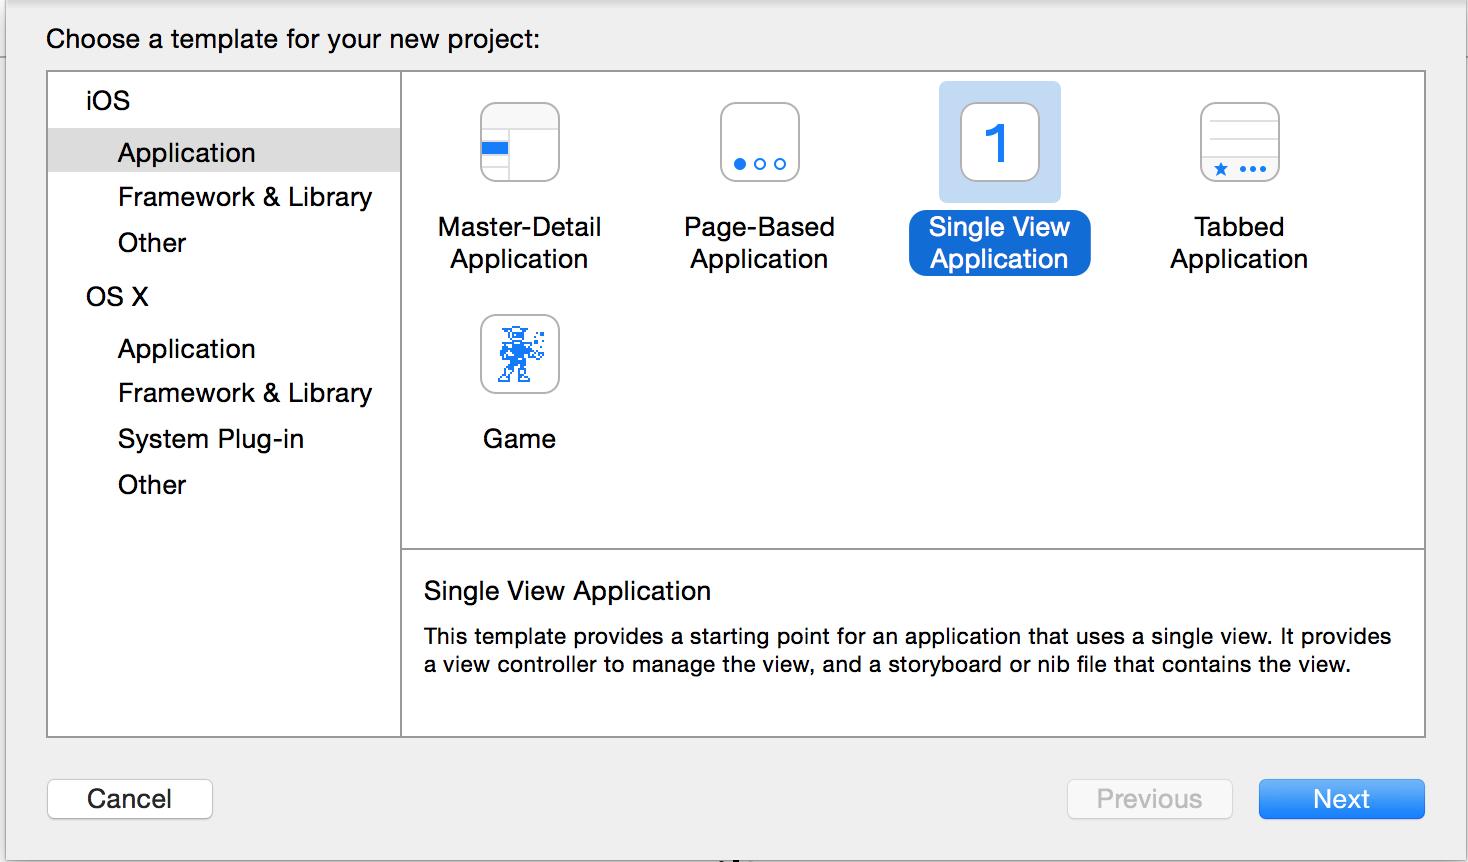 Single View Application